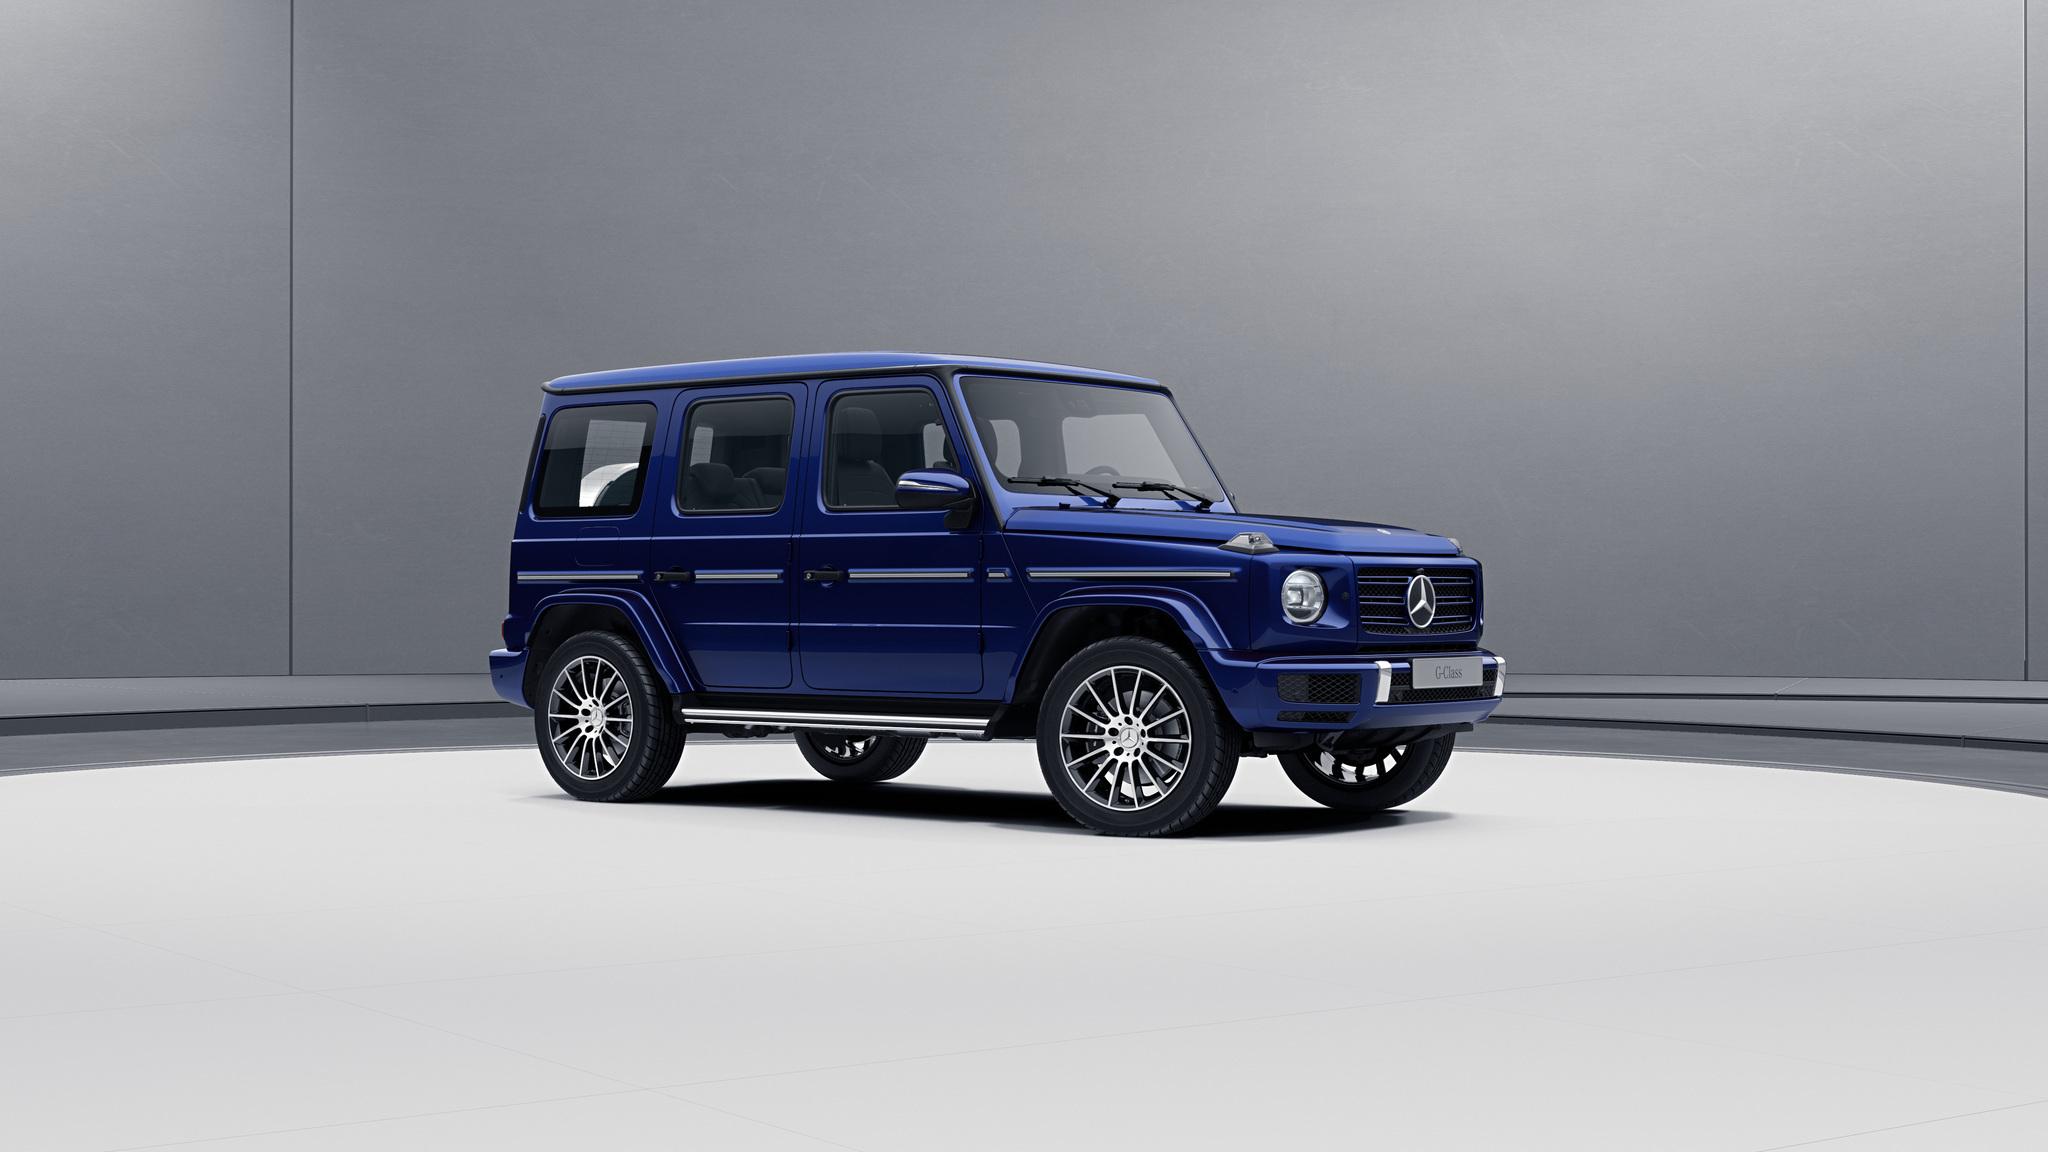 Vue de trois quarts de profil de la Mercedes-Benz classe G avec la peinture bright - bleu mystique bright métallisé G manufaktur